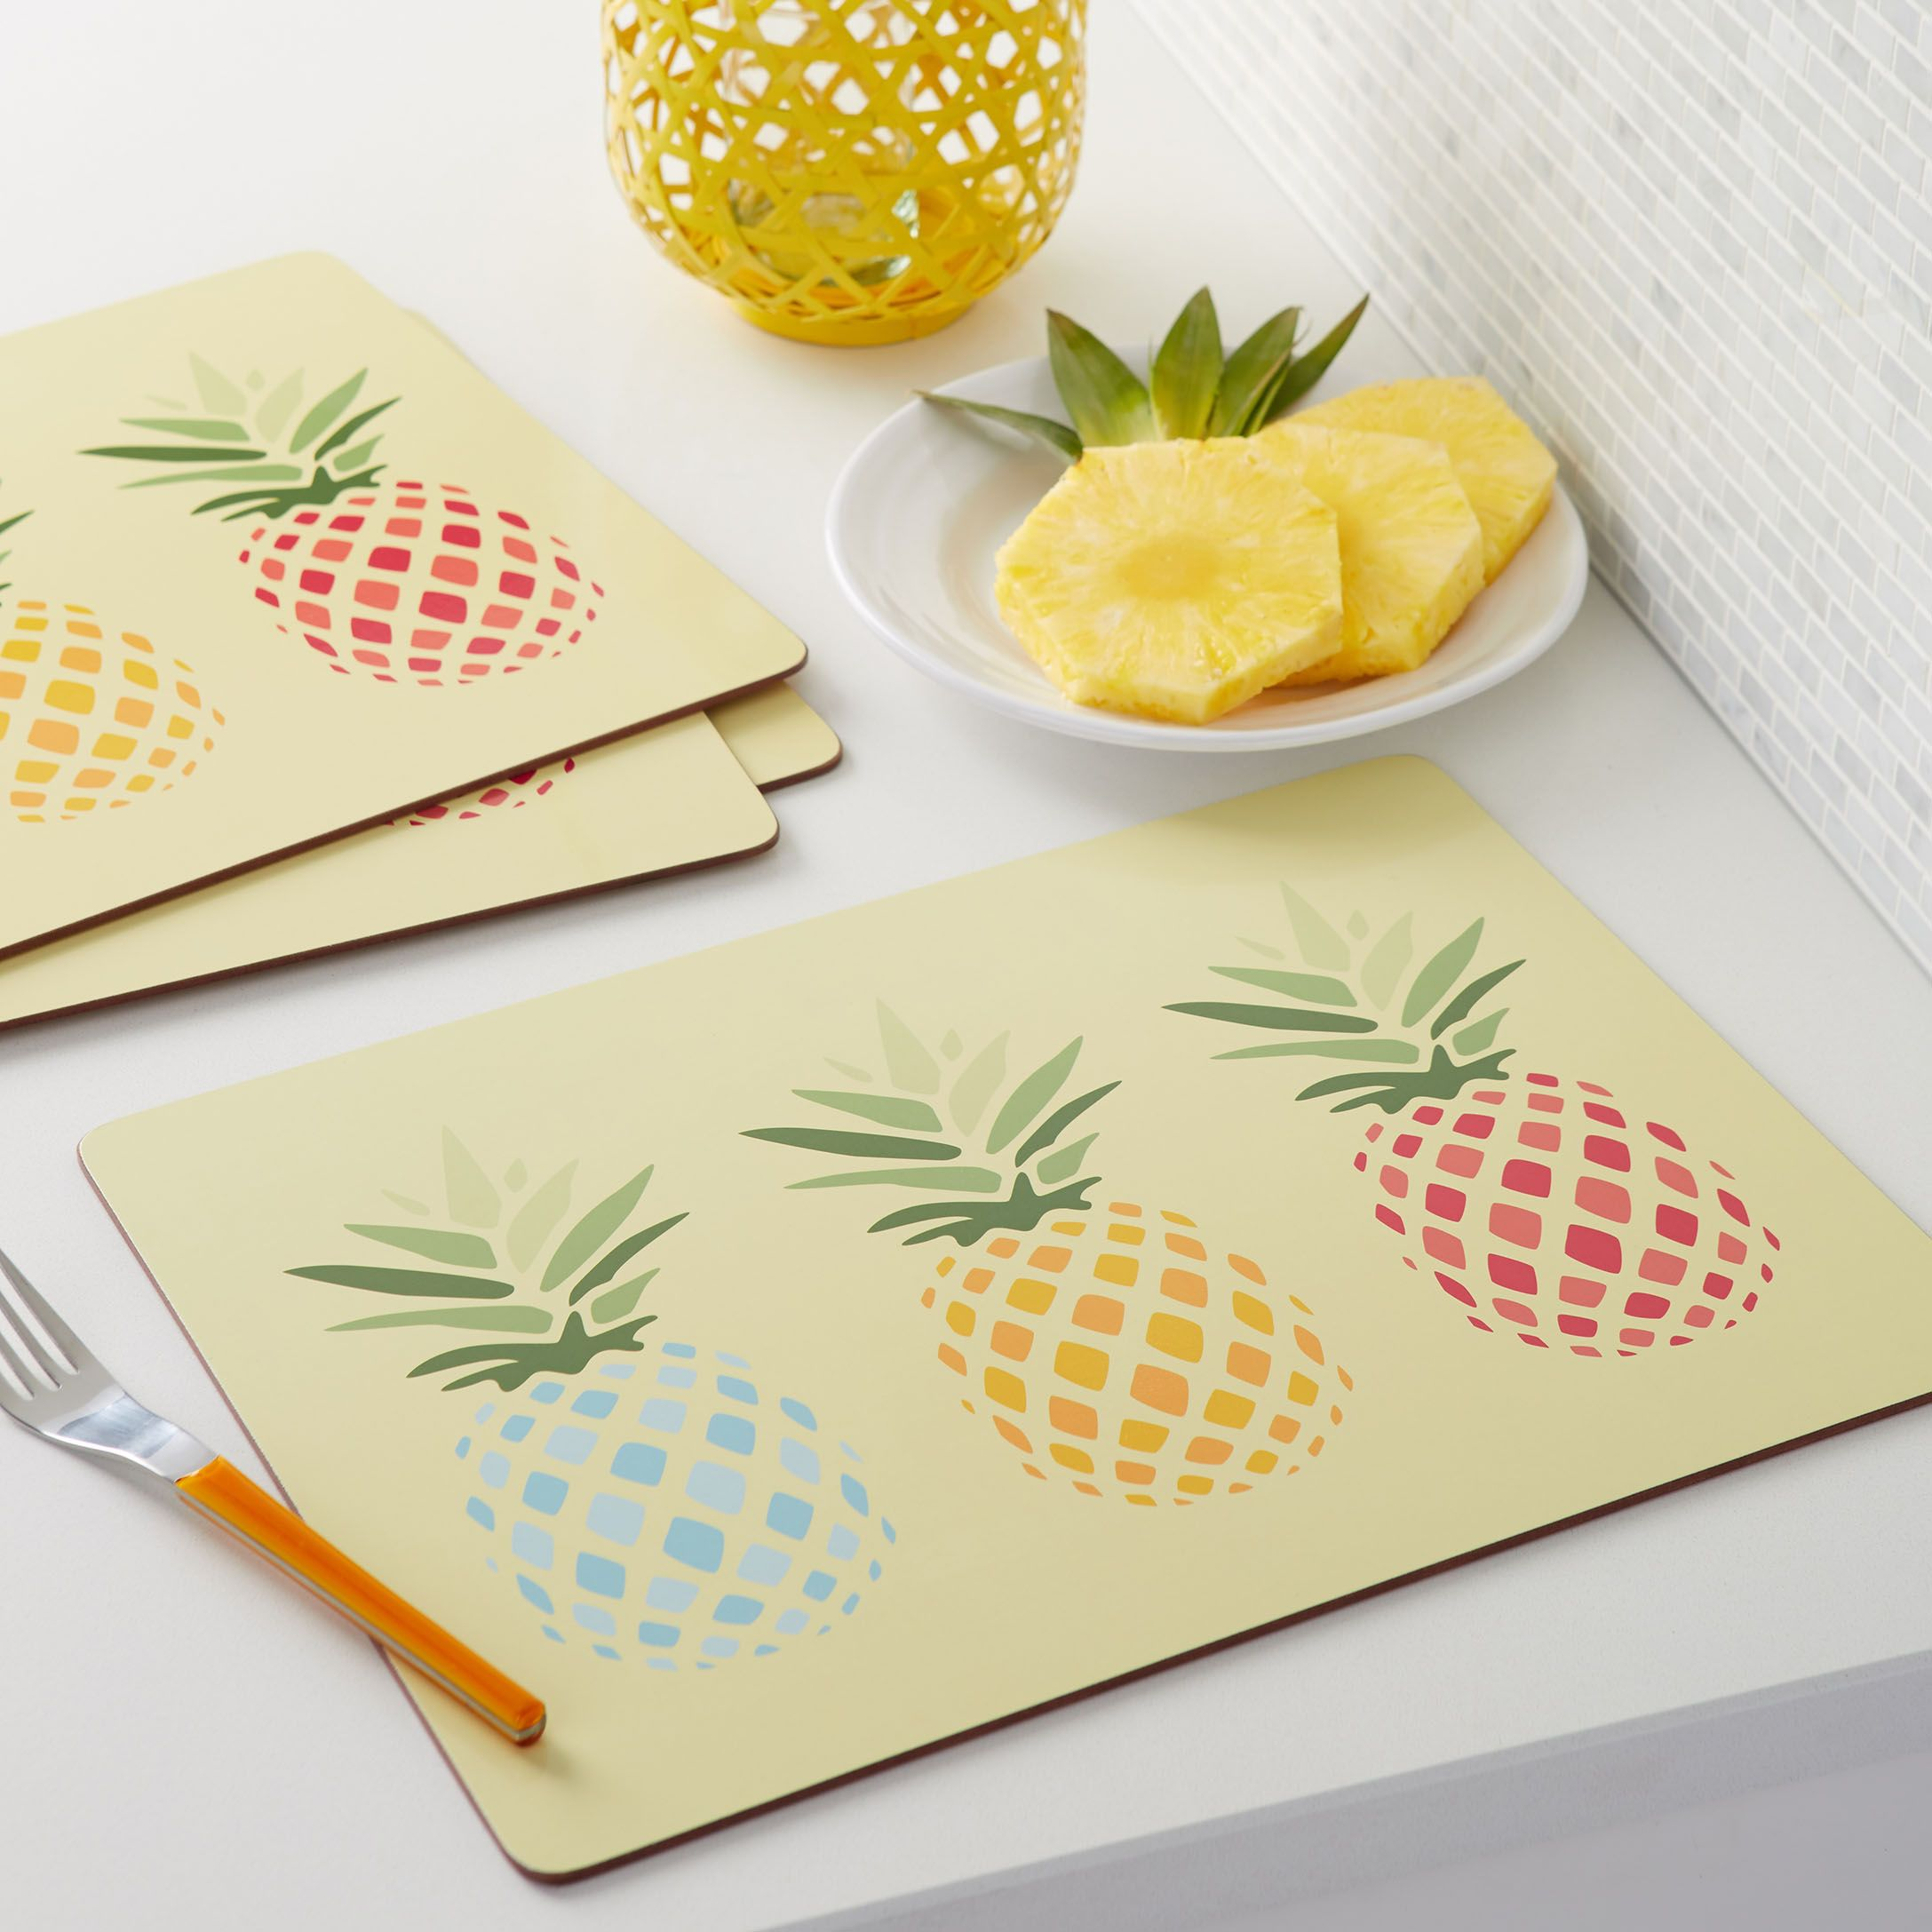 pineapple laminated cork place mats simons simonsmaison